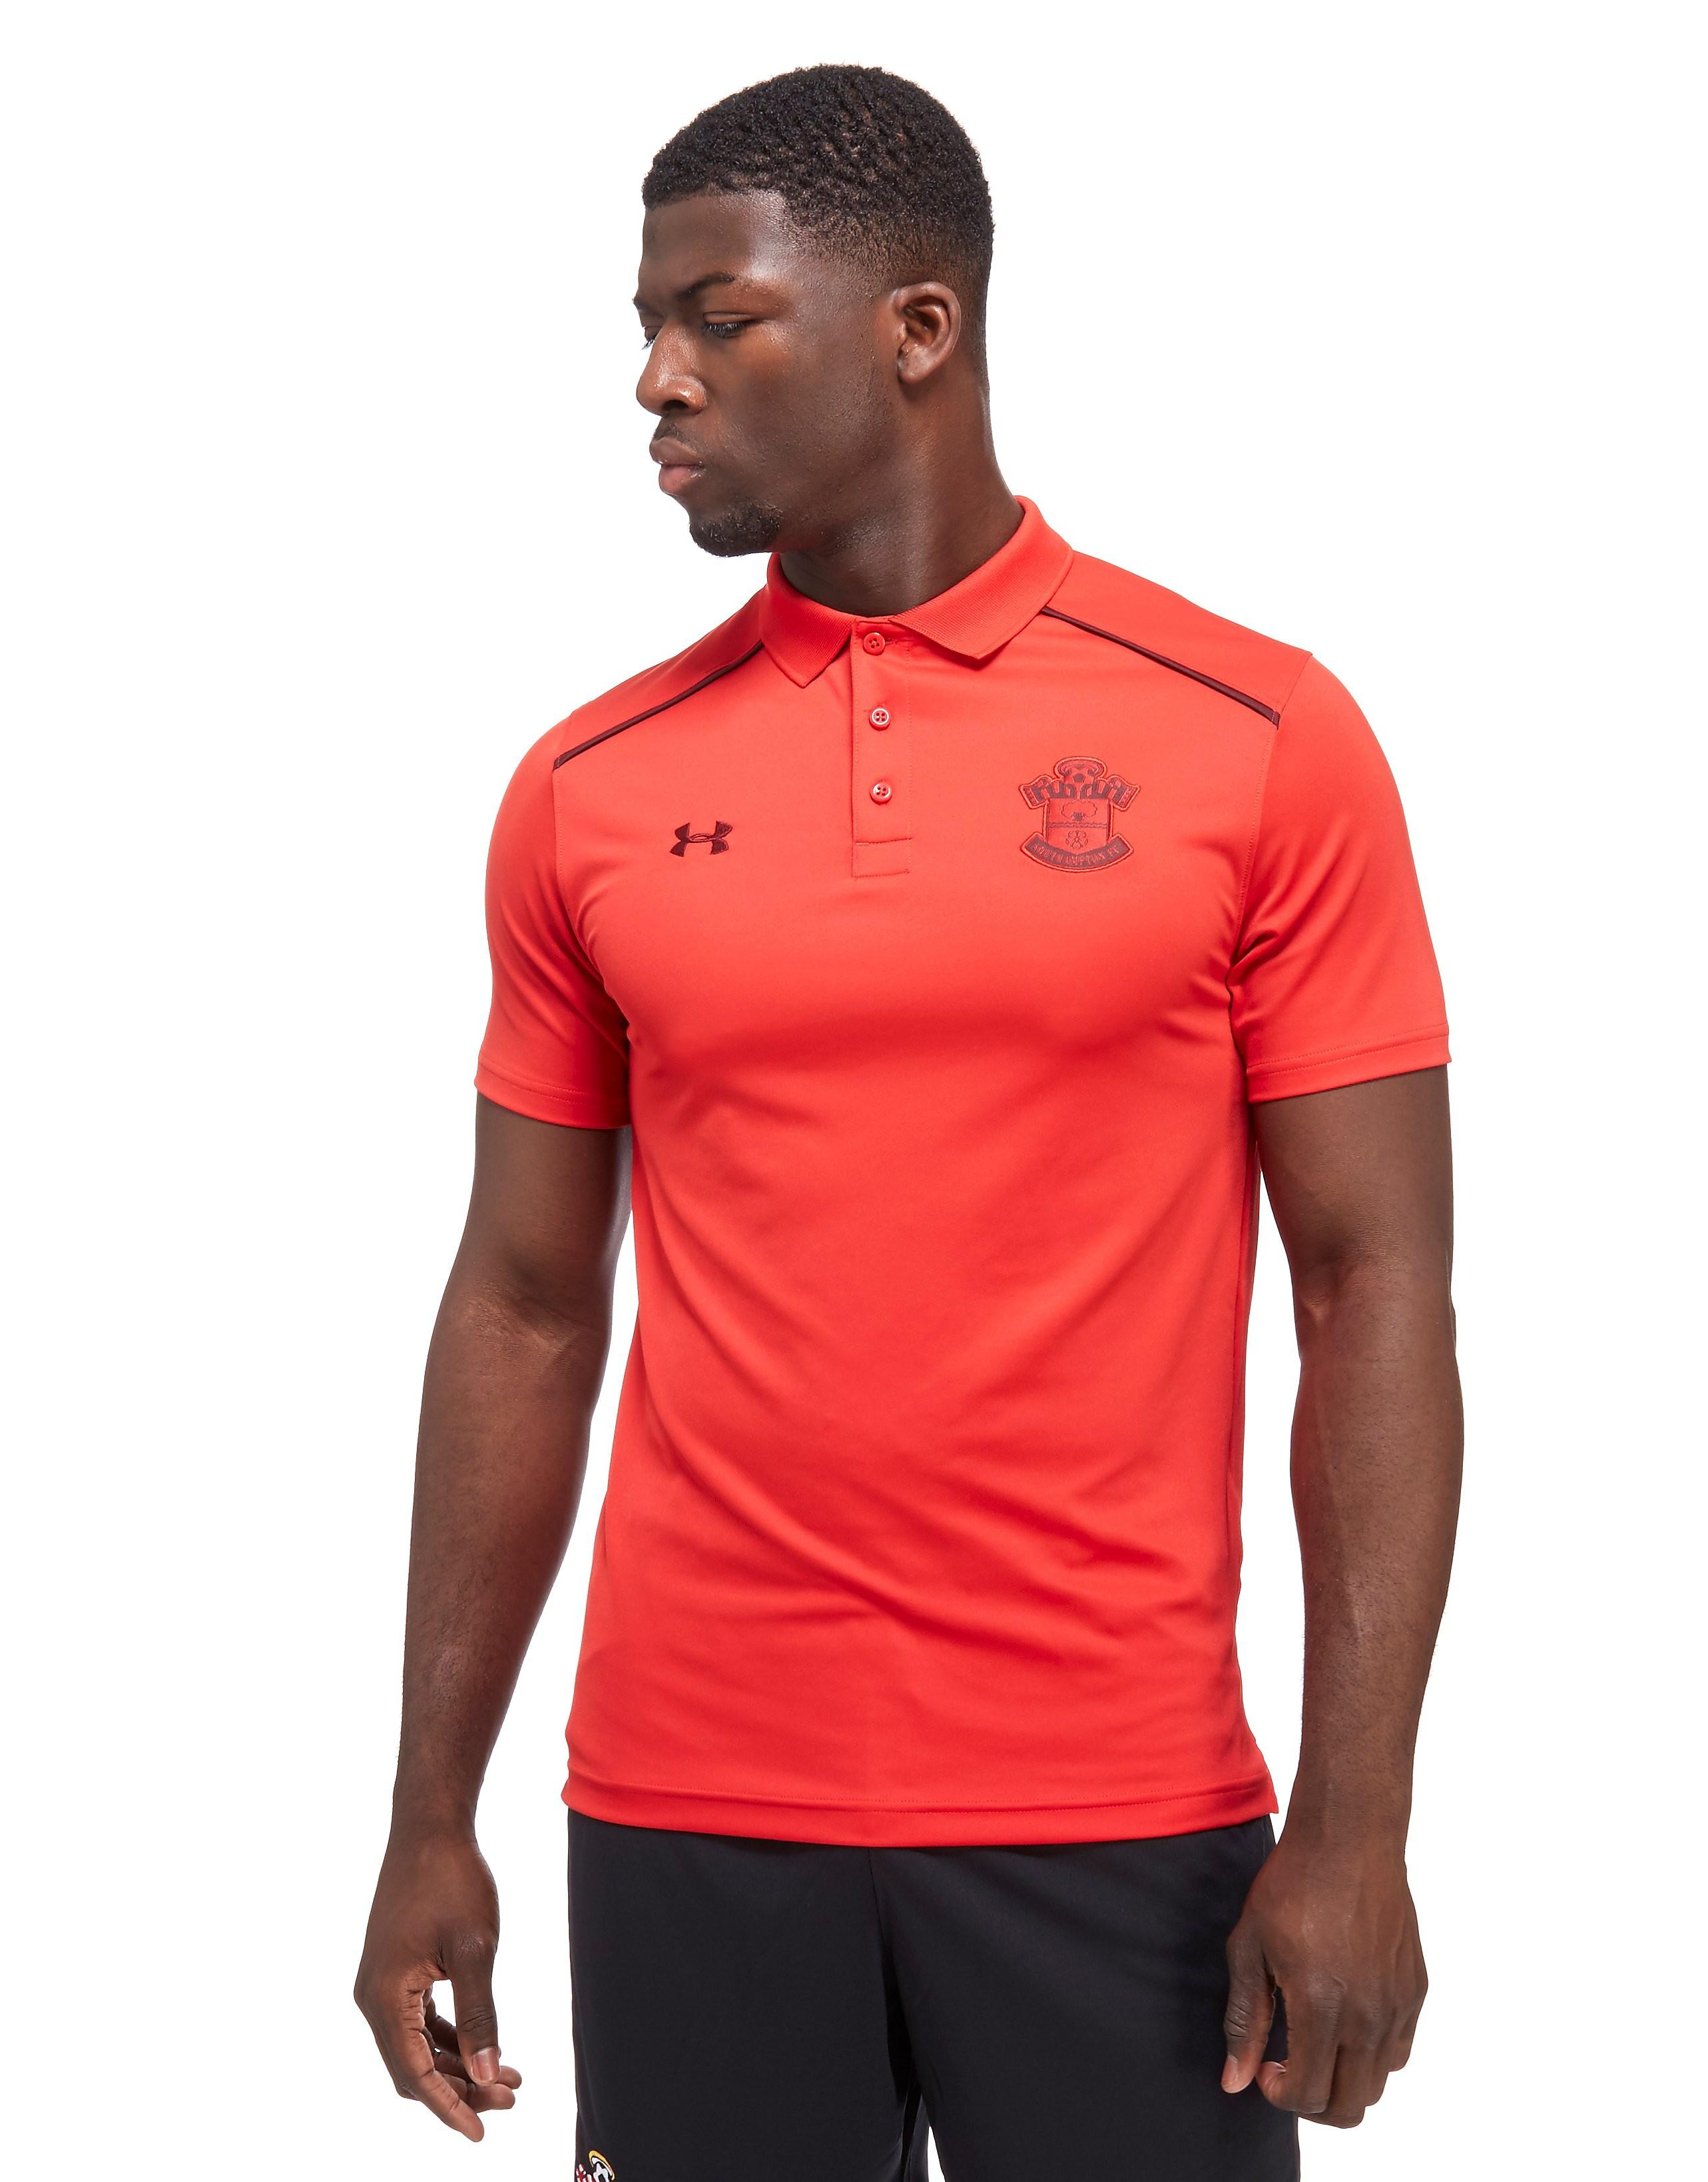 Under Armour Southampton FC 2017 Team Polo Shirt